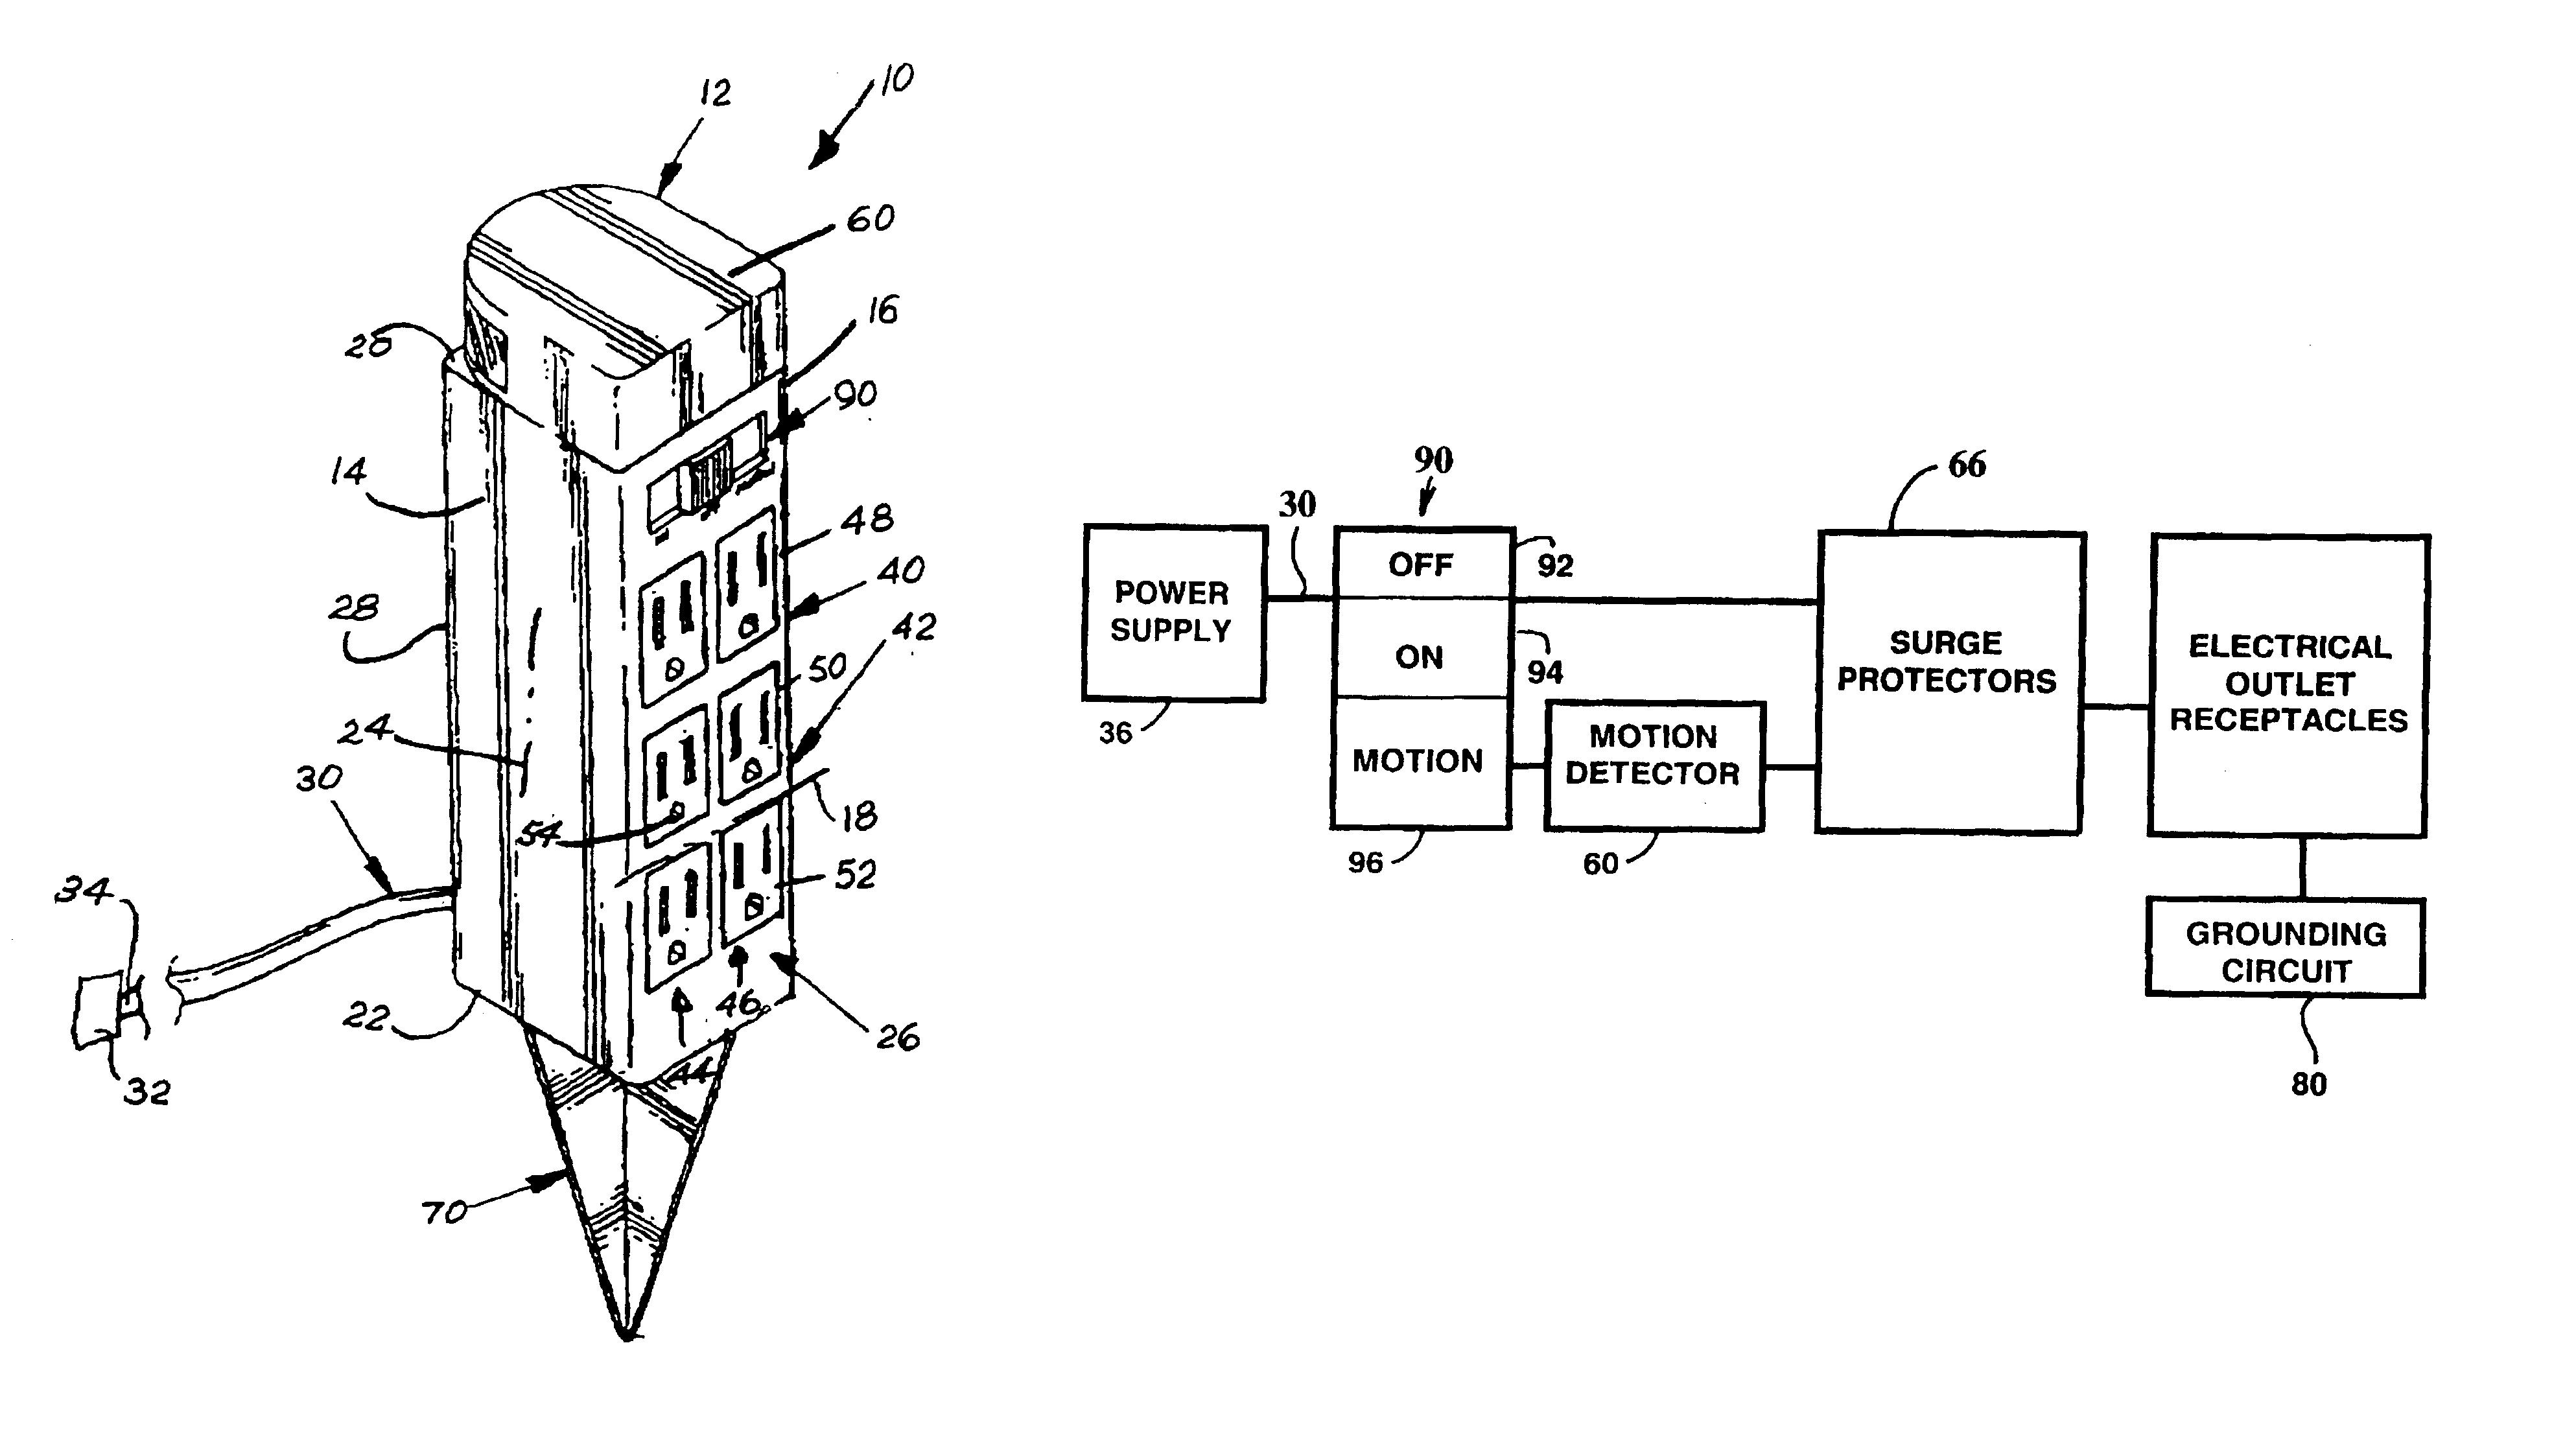 patent us6731024 - motion sensor-controlled power strip